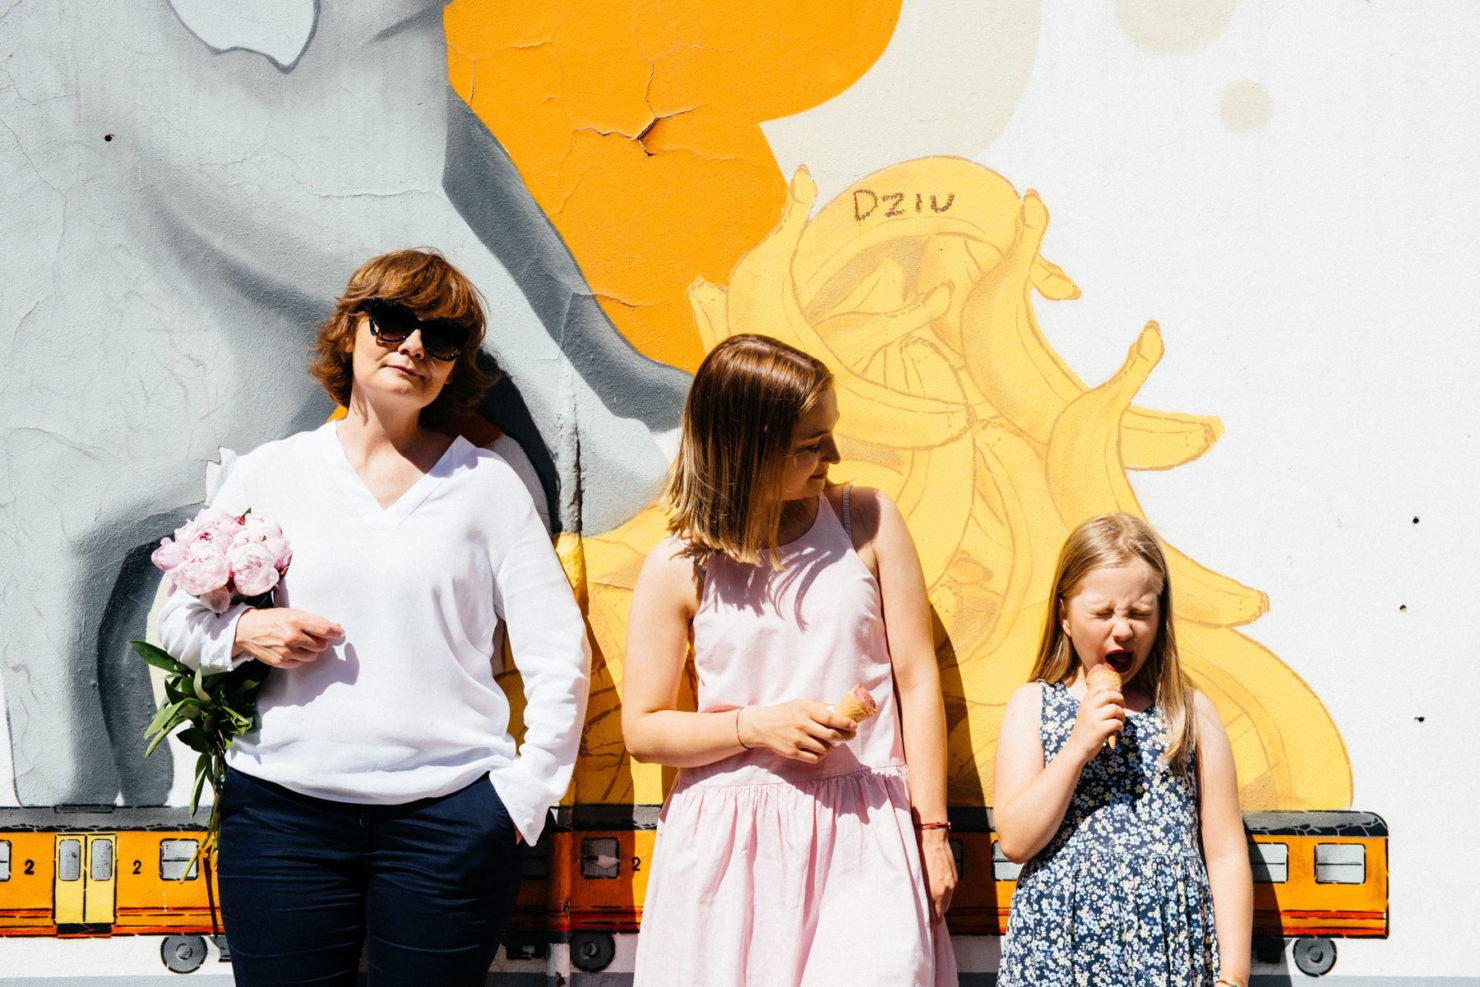 Sesja z mamą w Warszawie - sesja z mamą w warszawie